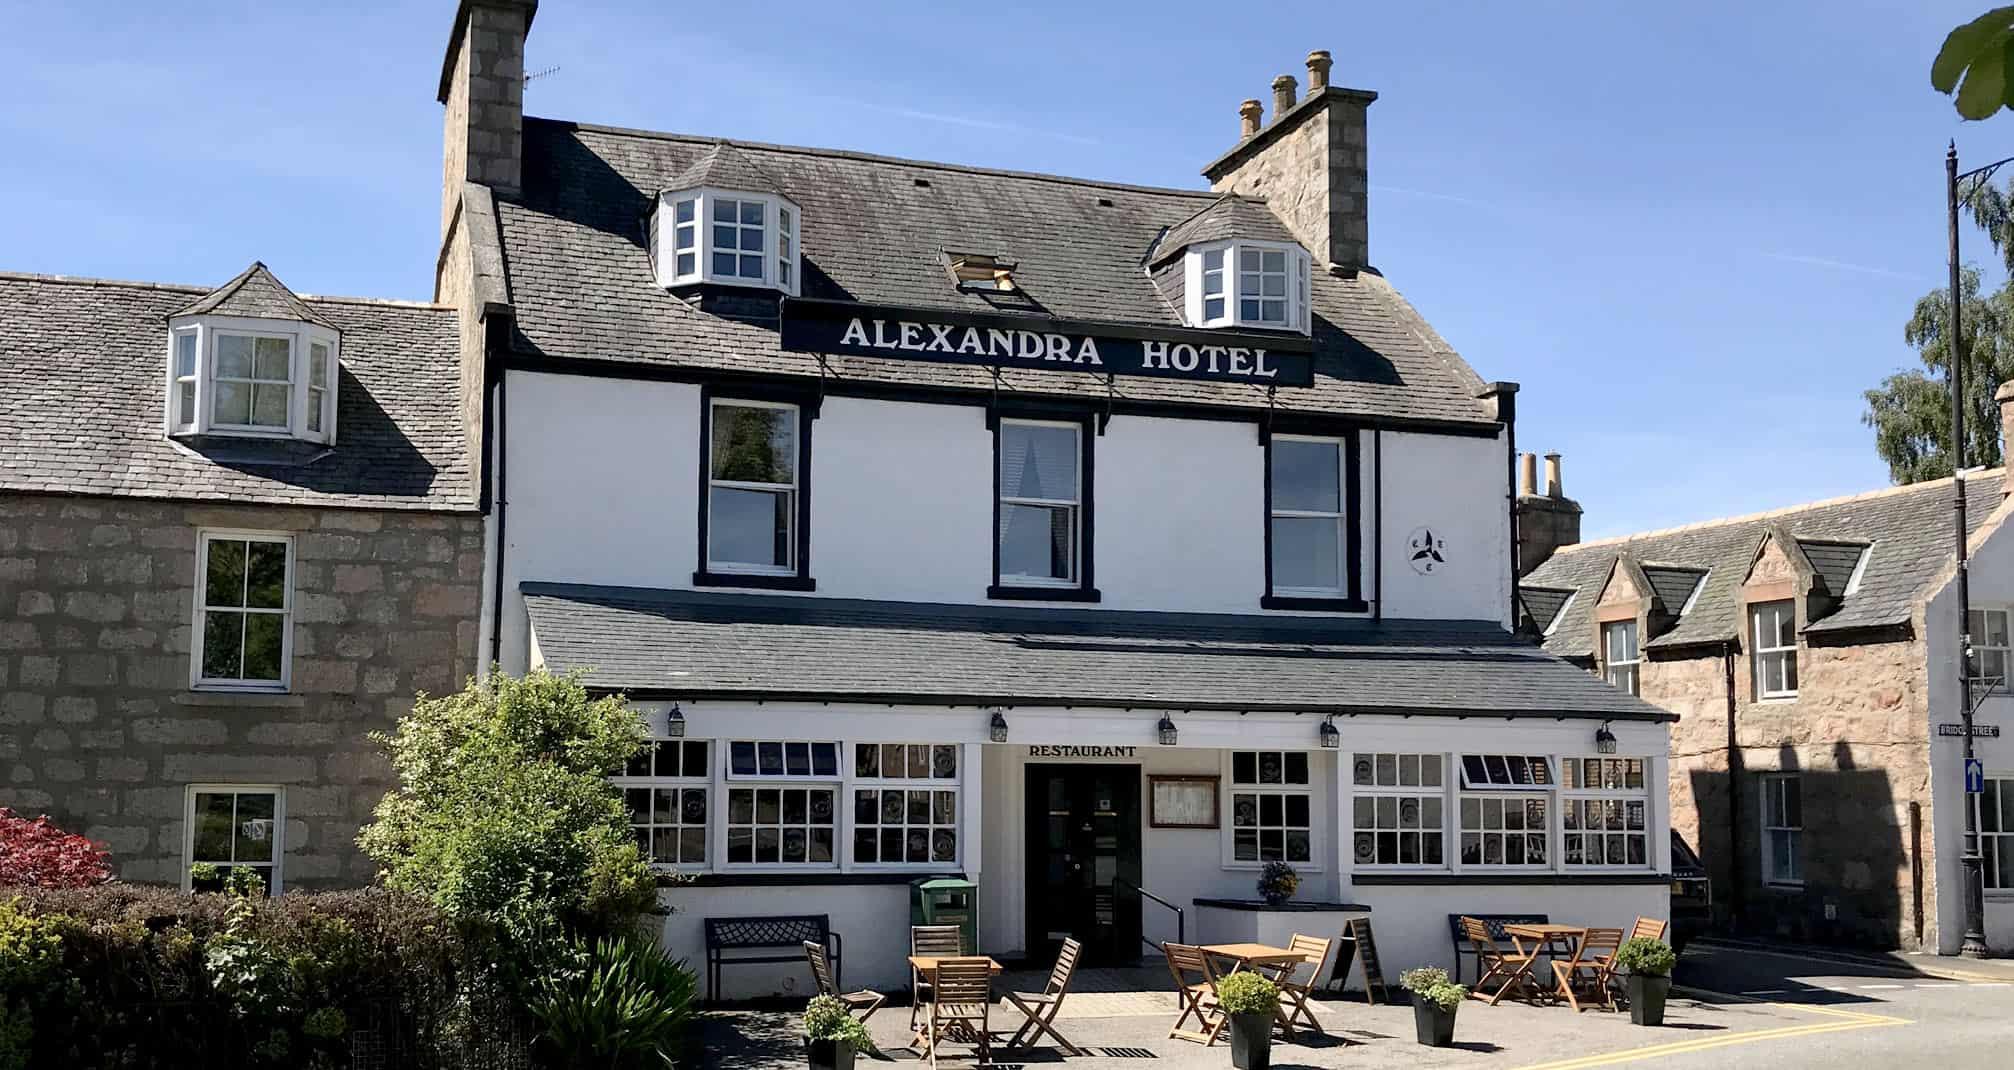 hotels in ballater - Alexandra Hotel